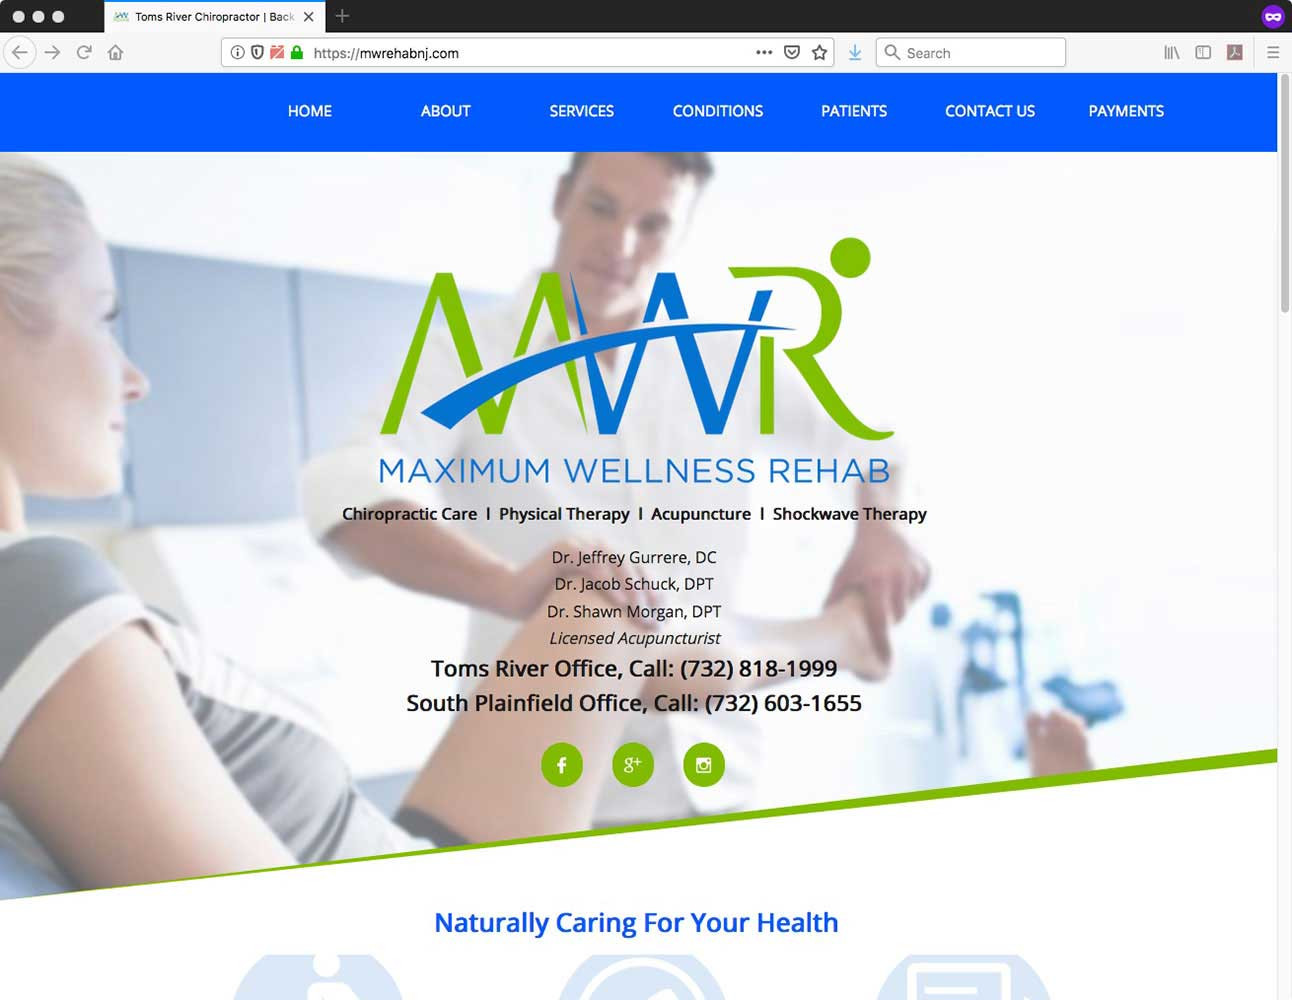 MWR_Chiropractor.jpg